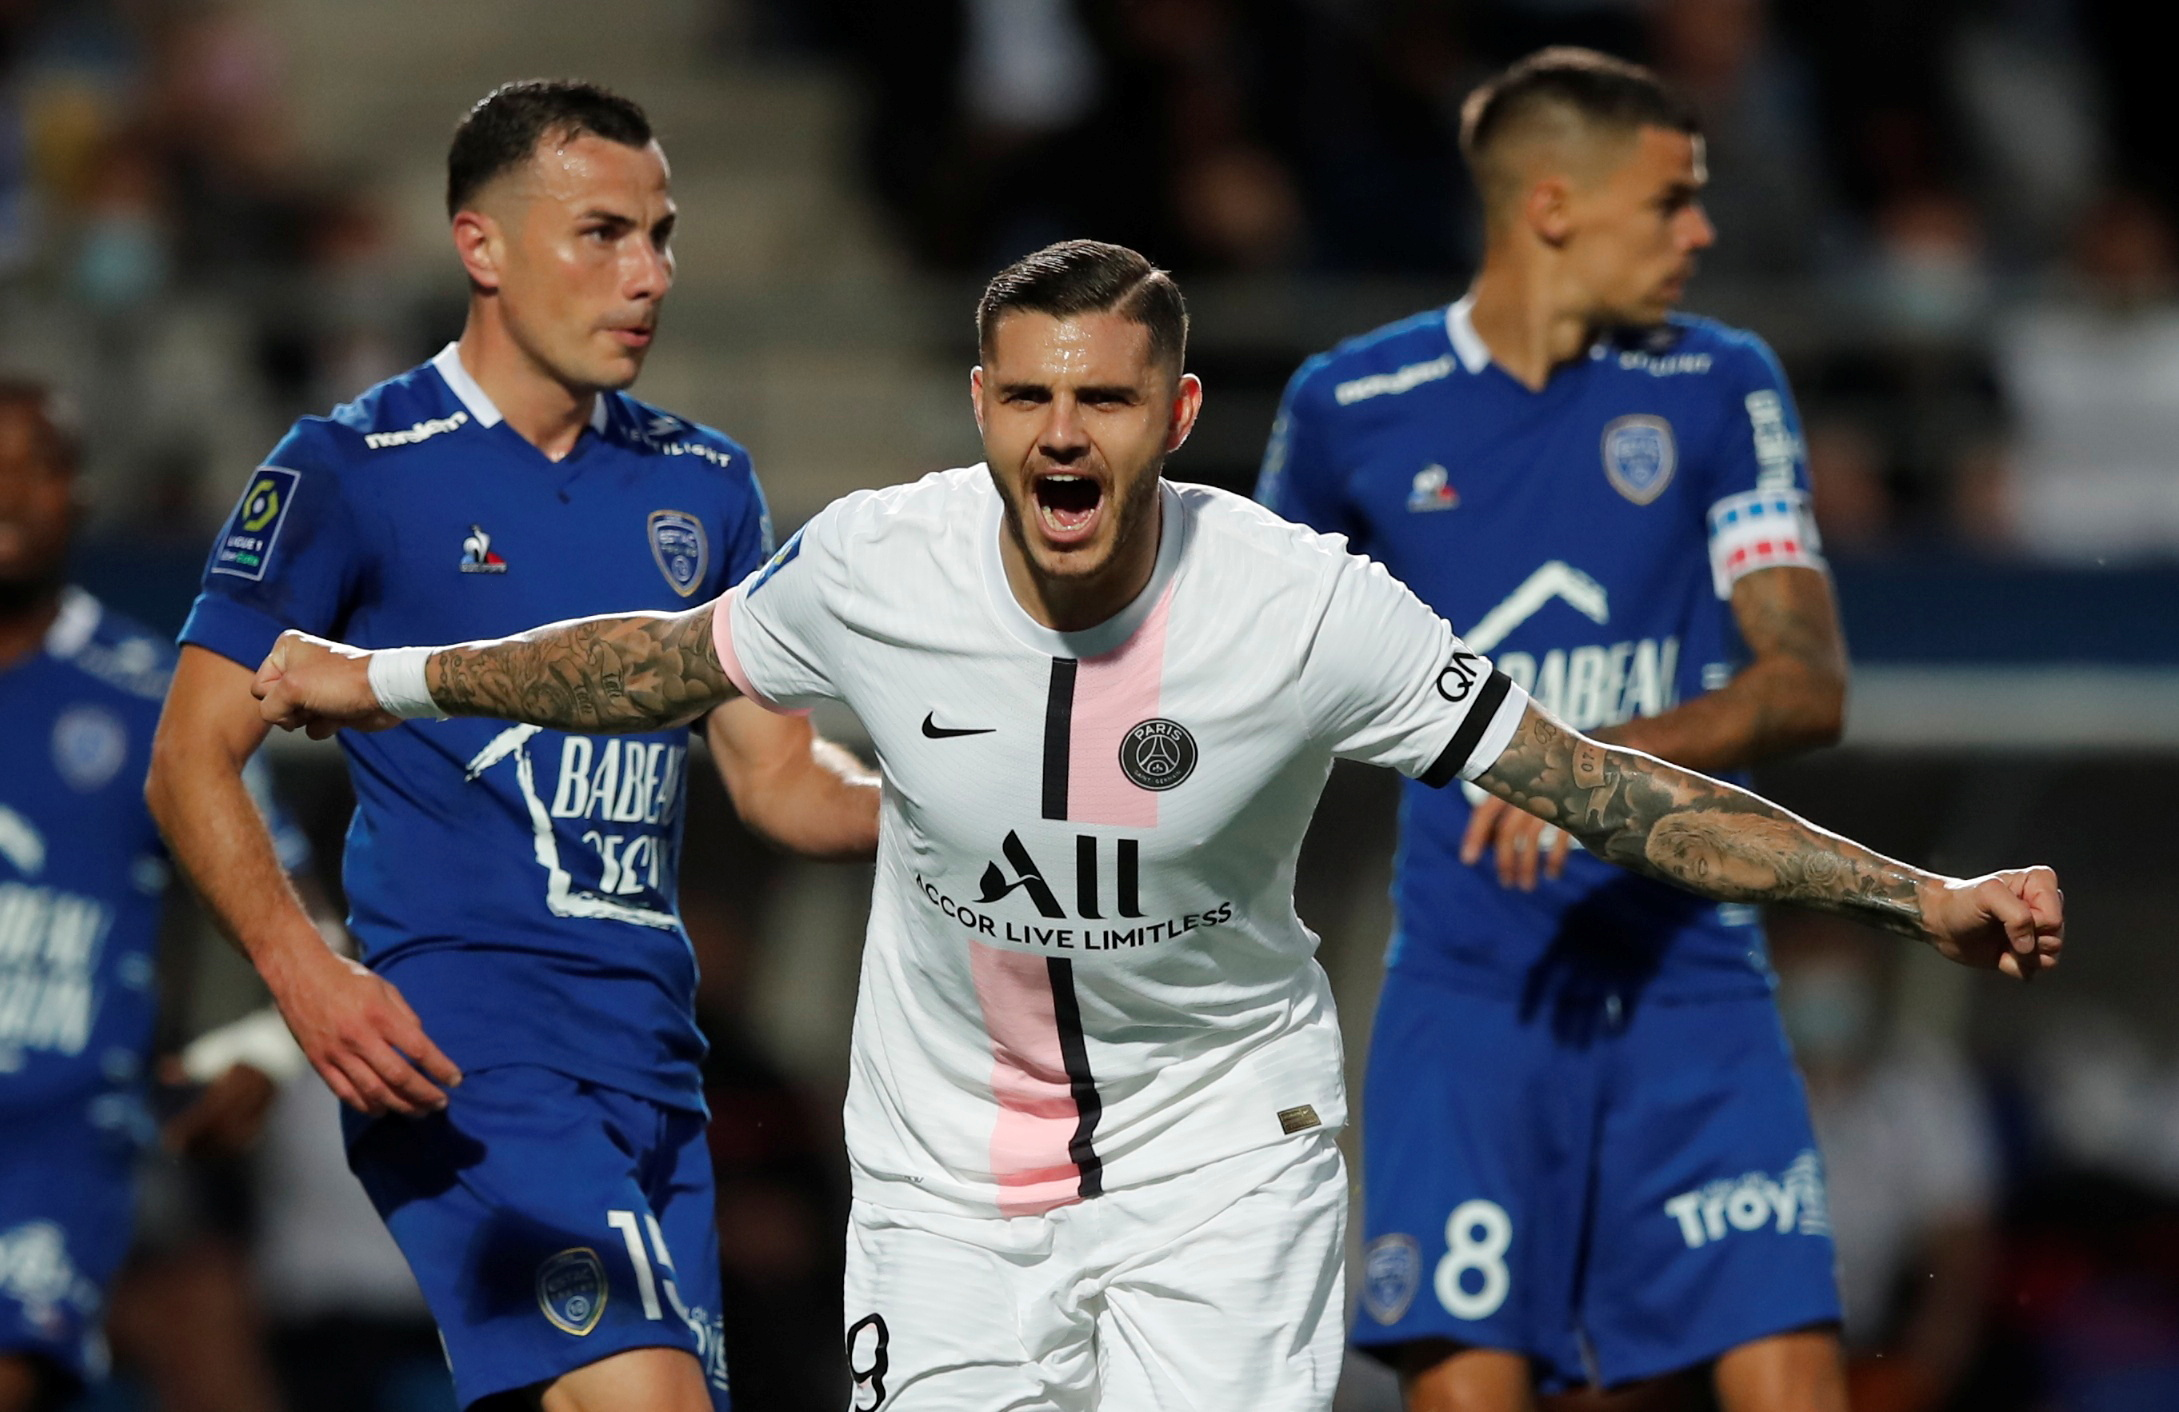 Ligue 1: Με το δεξί η Παρί πριν την άφιξη Μέσι – Γλίτωσε τα χειρότερα στην πρεμιέρα η Λιόν